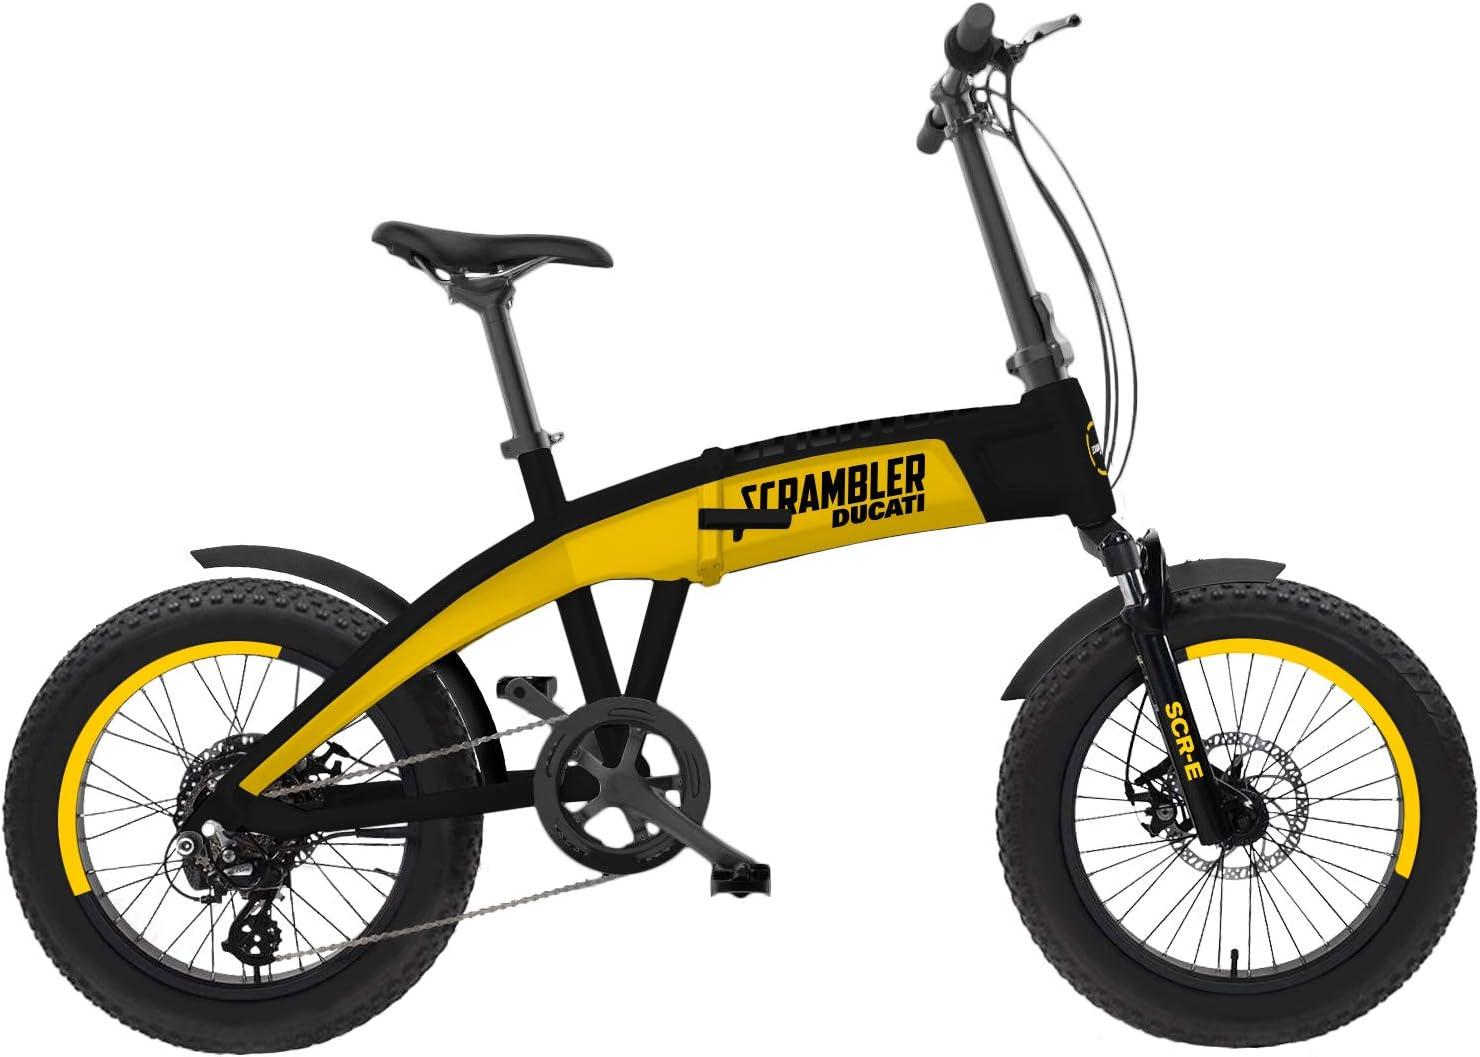 Scrambler Ducati Bike Scr E Electric Bike With Fat Wheels Unisex Adult Yellow And Black One Size Sport Freizeit